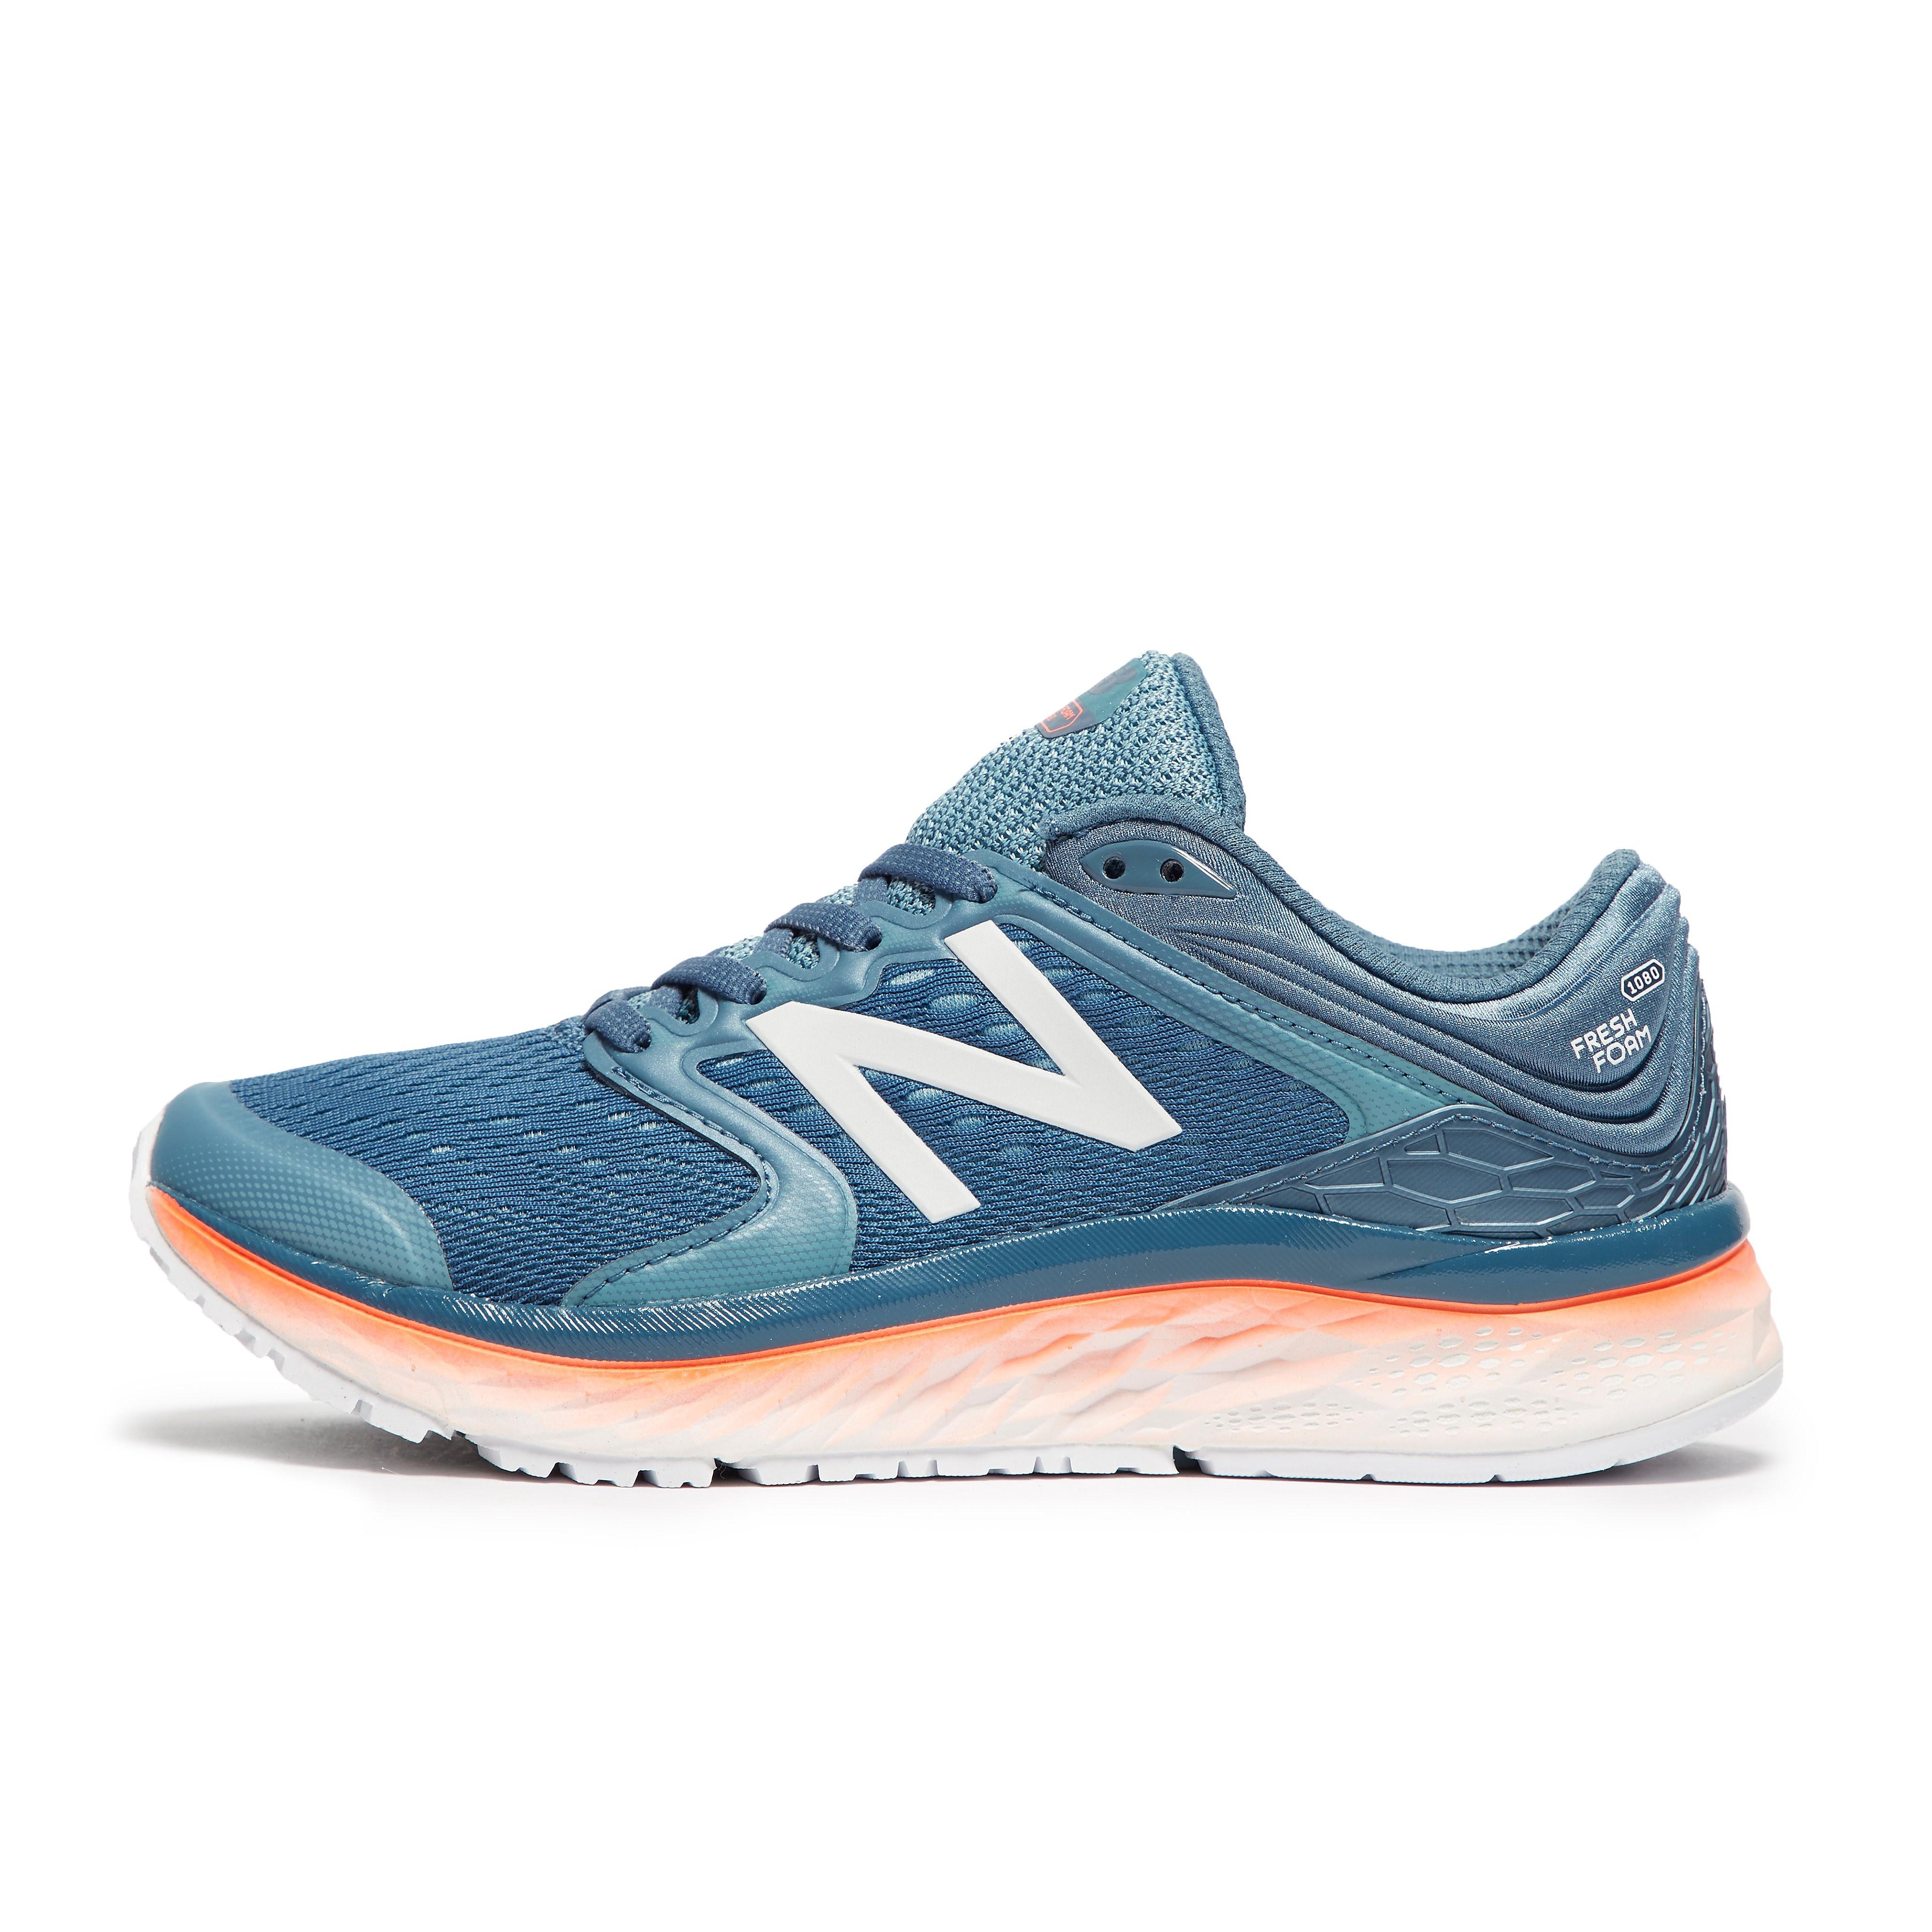 Womens Blue New Balance Fresh Foam 1080v8 Running Shoes